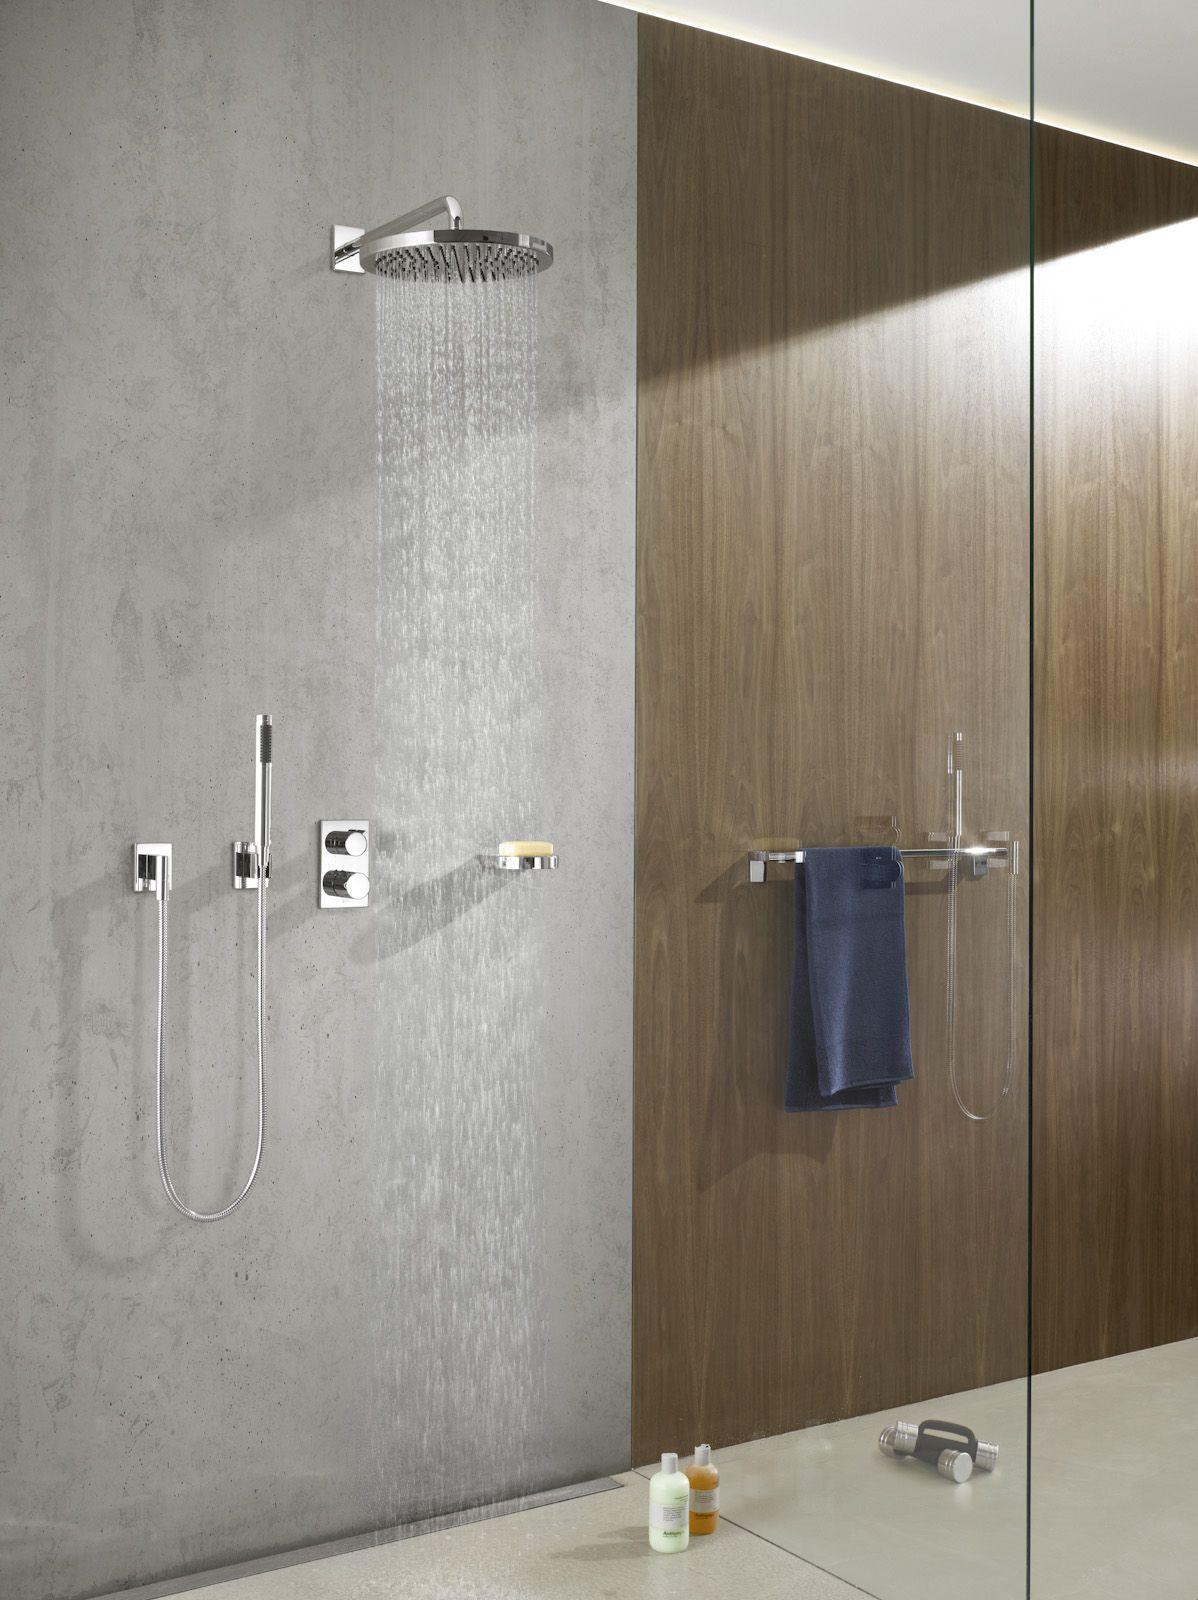 Dornbracht Imo Rain Shower With Wall Connection 28549670